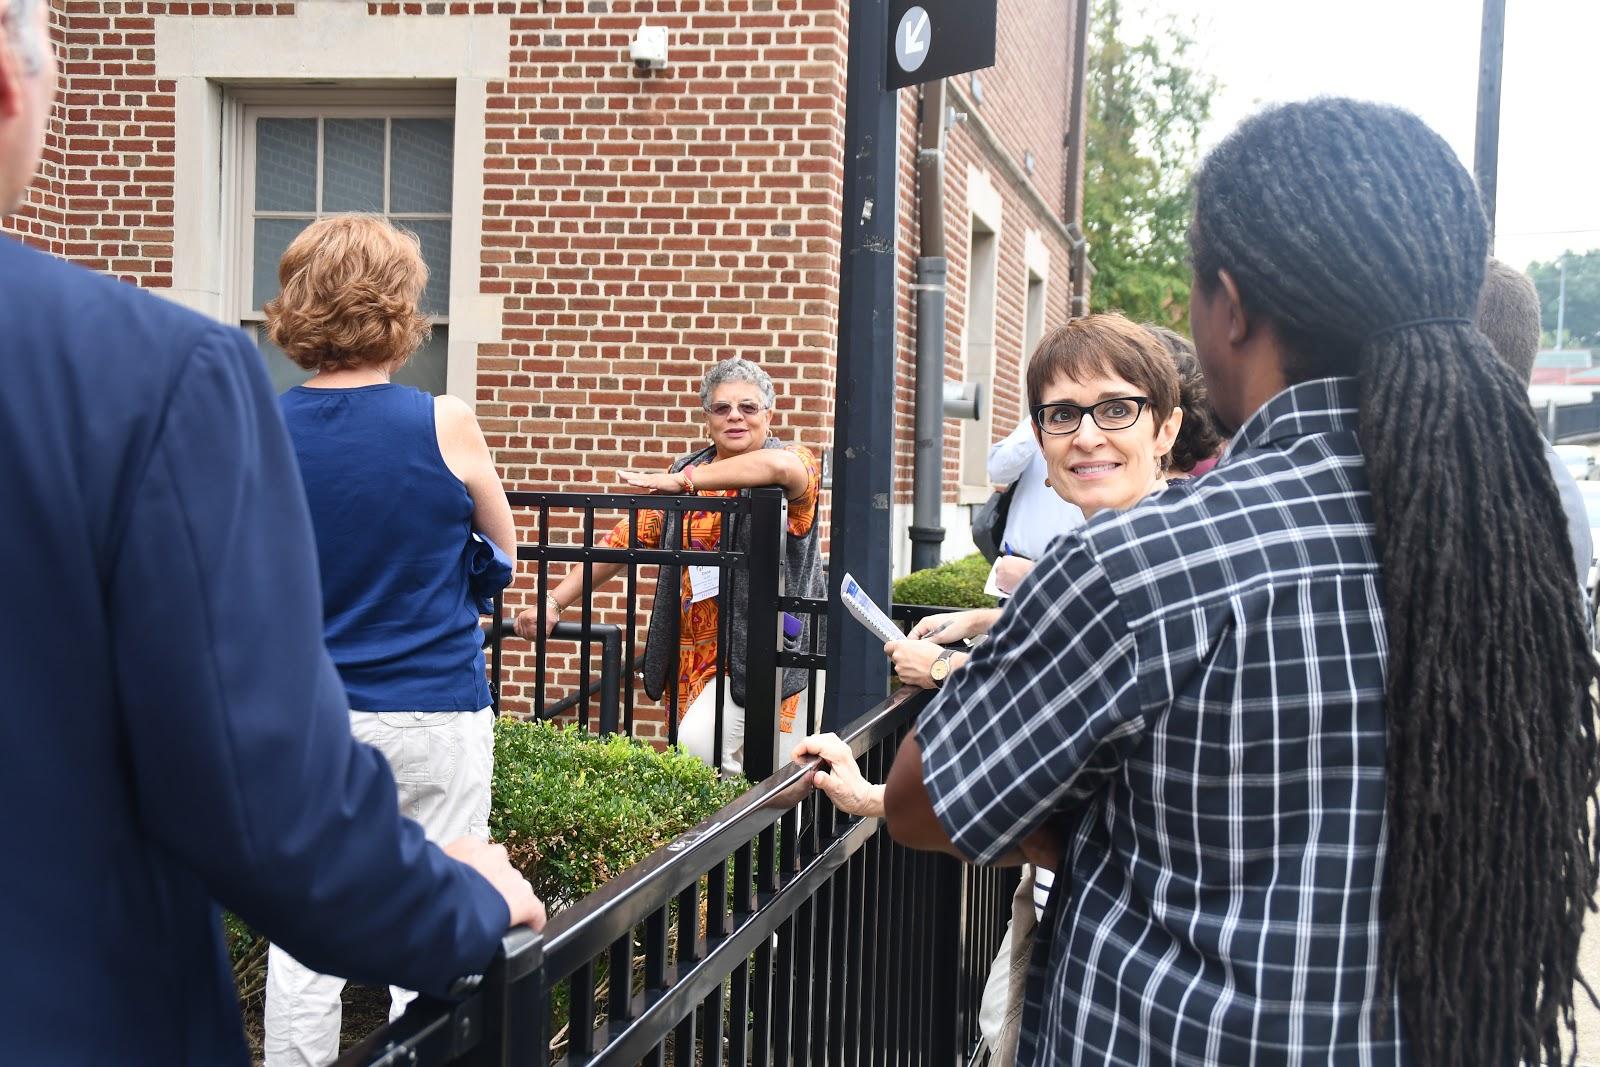 Zinna Scott, Jerome Jackson of OBB and Brenda Smith at the Homewood Public Library.